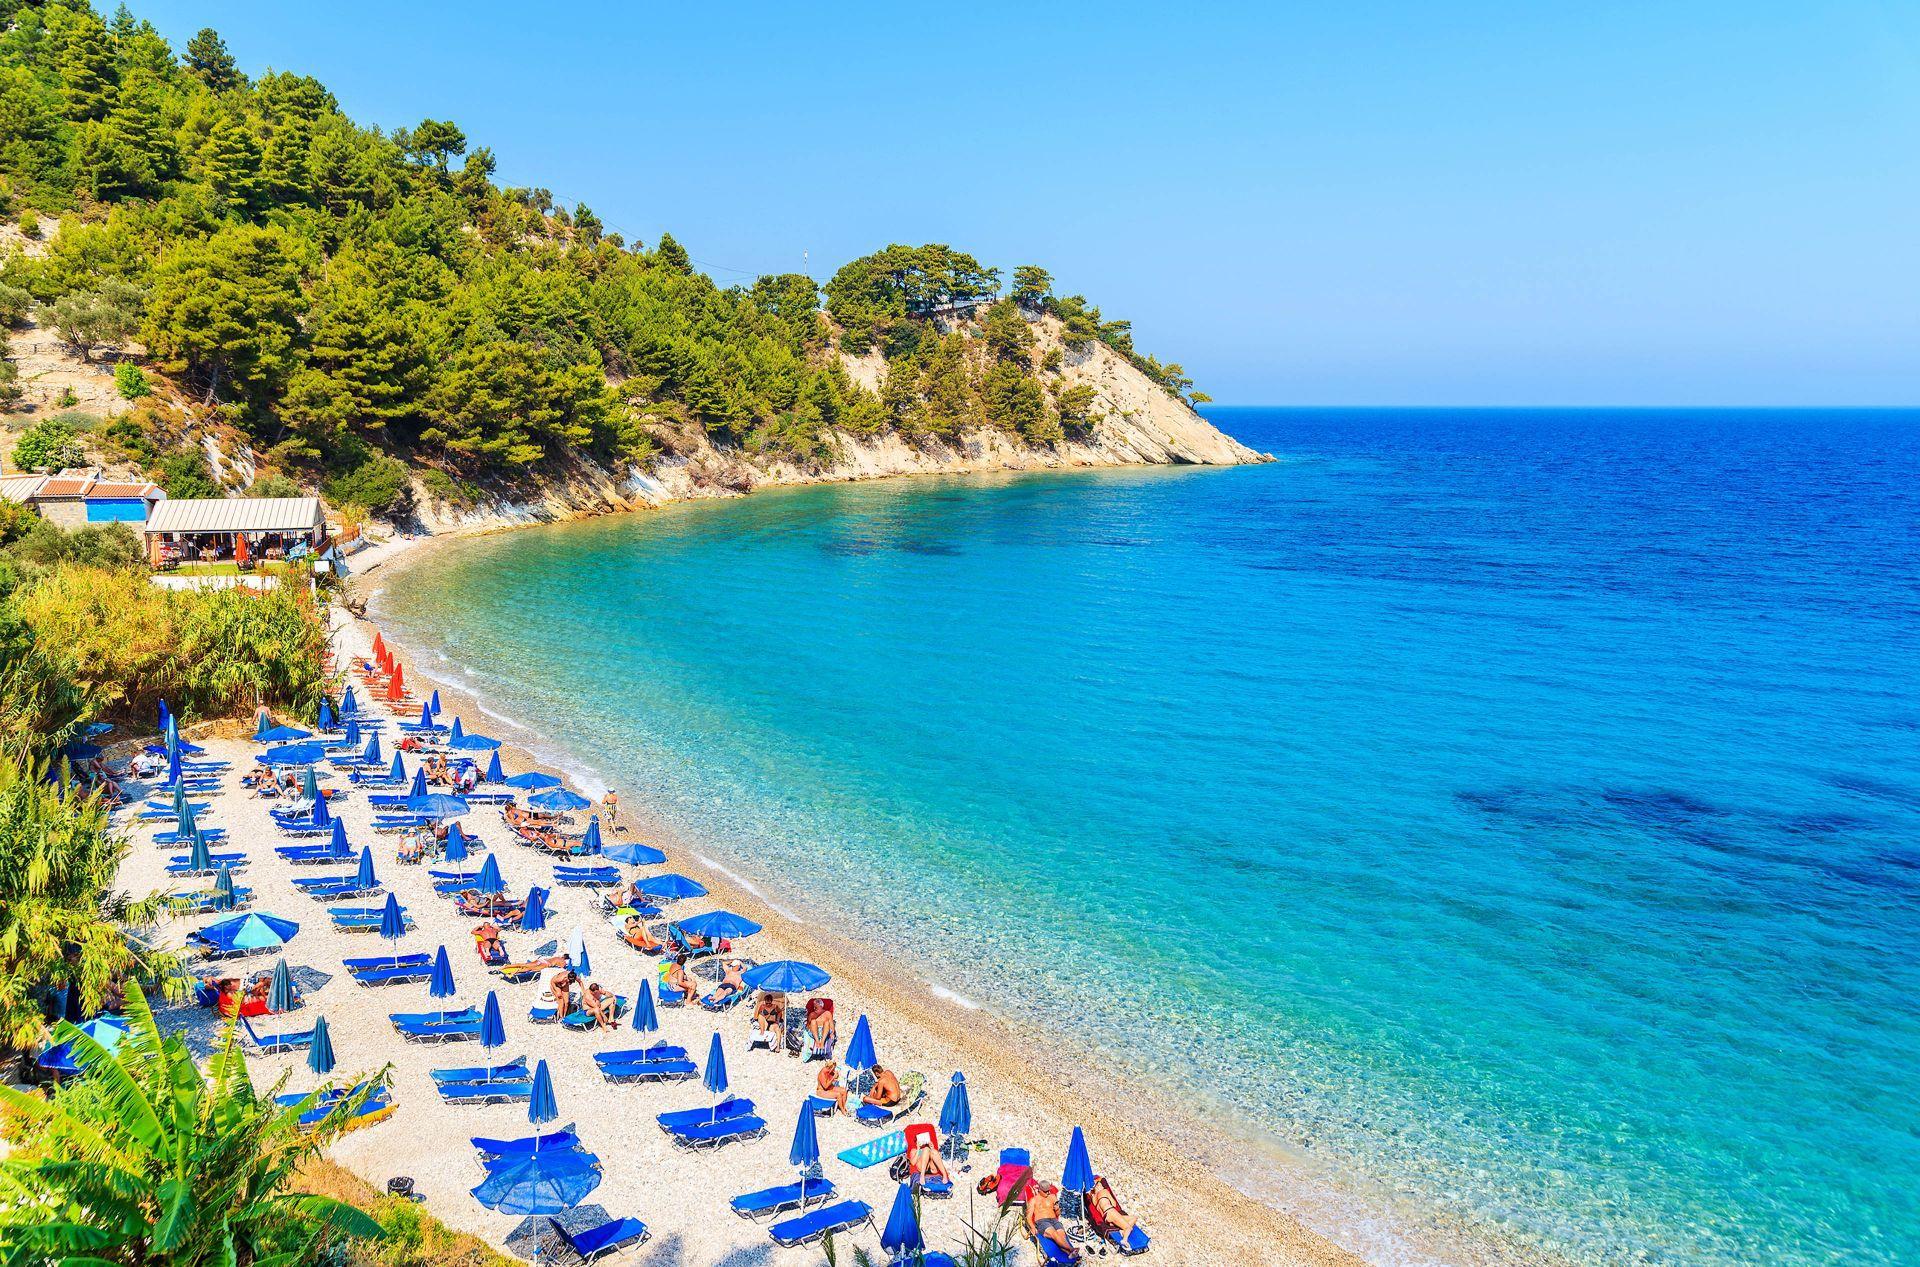 Eastern Aegean islands: Lemonakia beach on Samos island